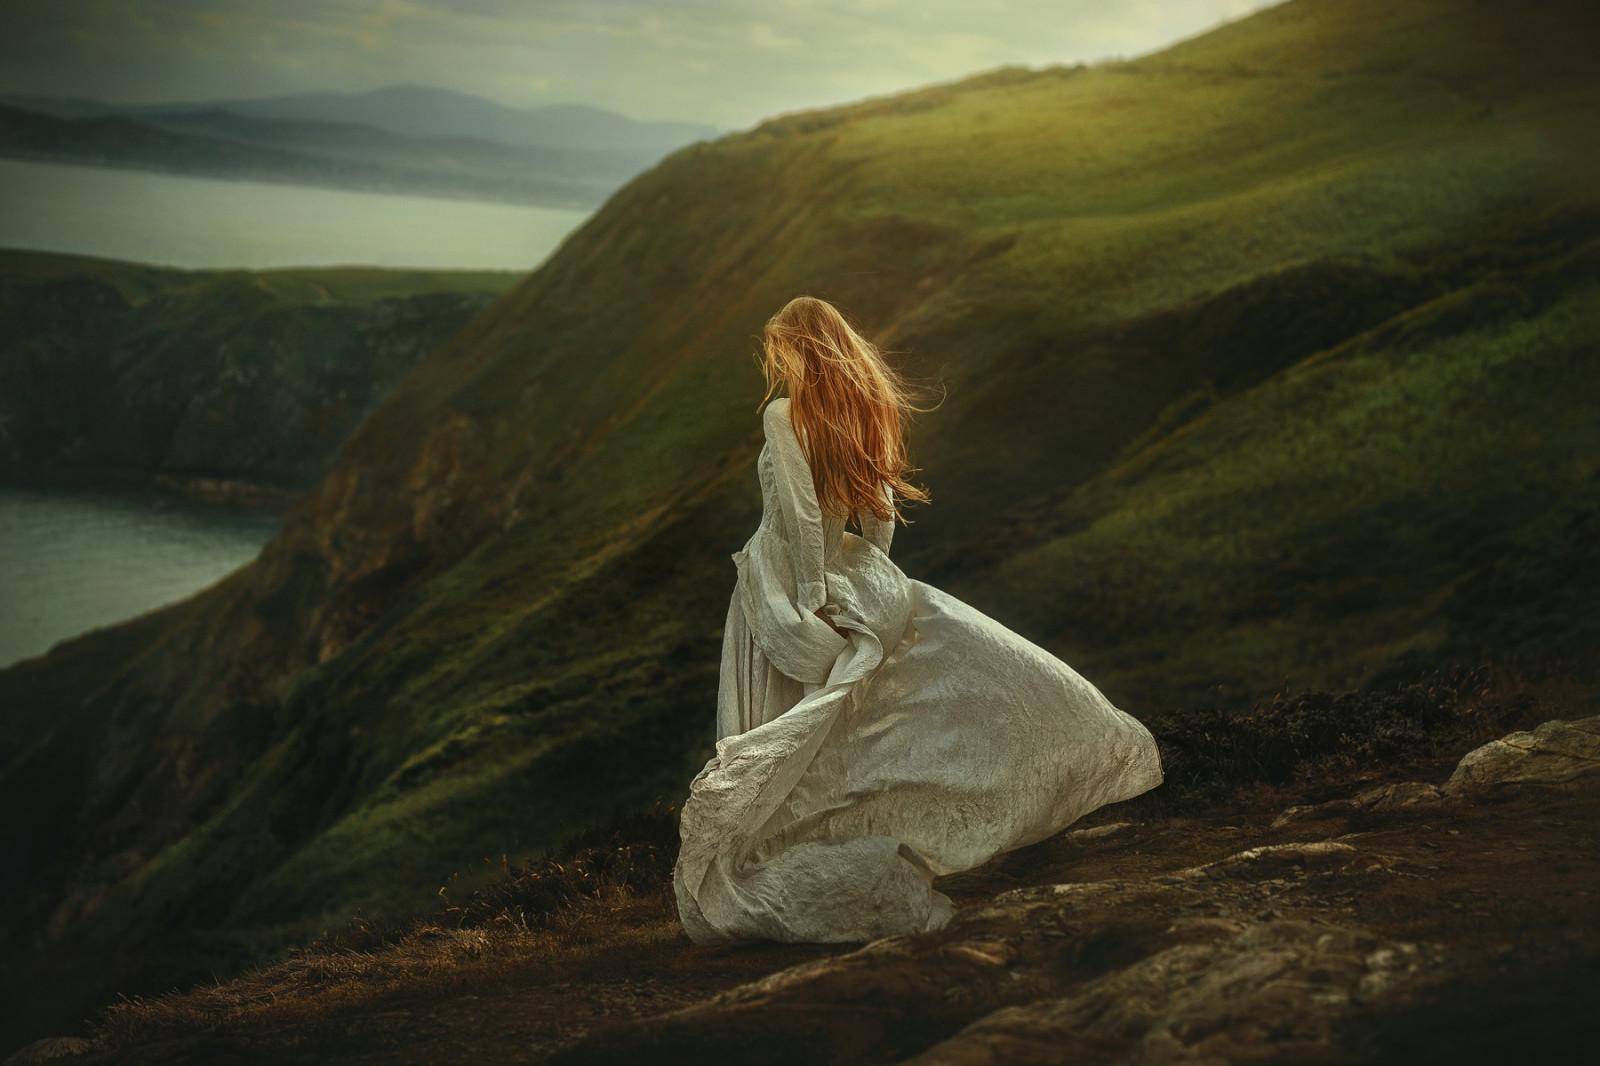 women_model_redhead_white_dress_hills_cliff_coast_emotion-109003